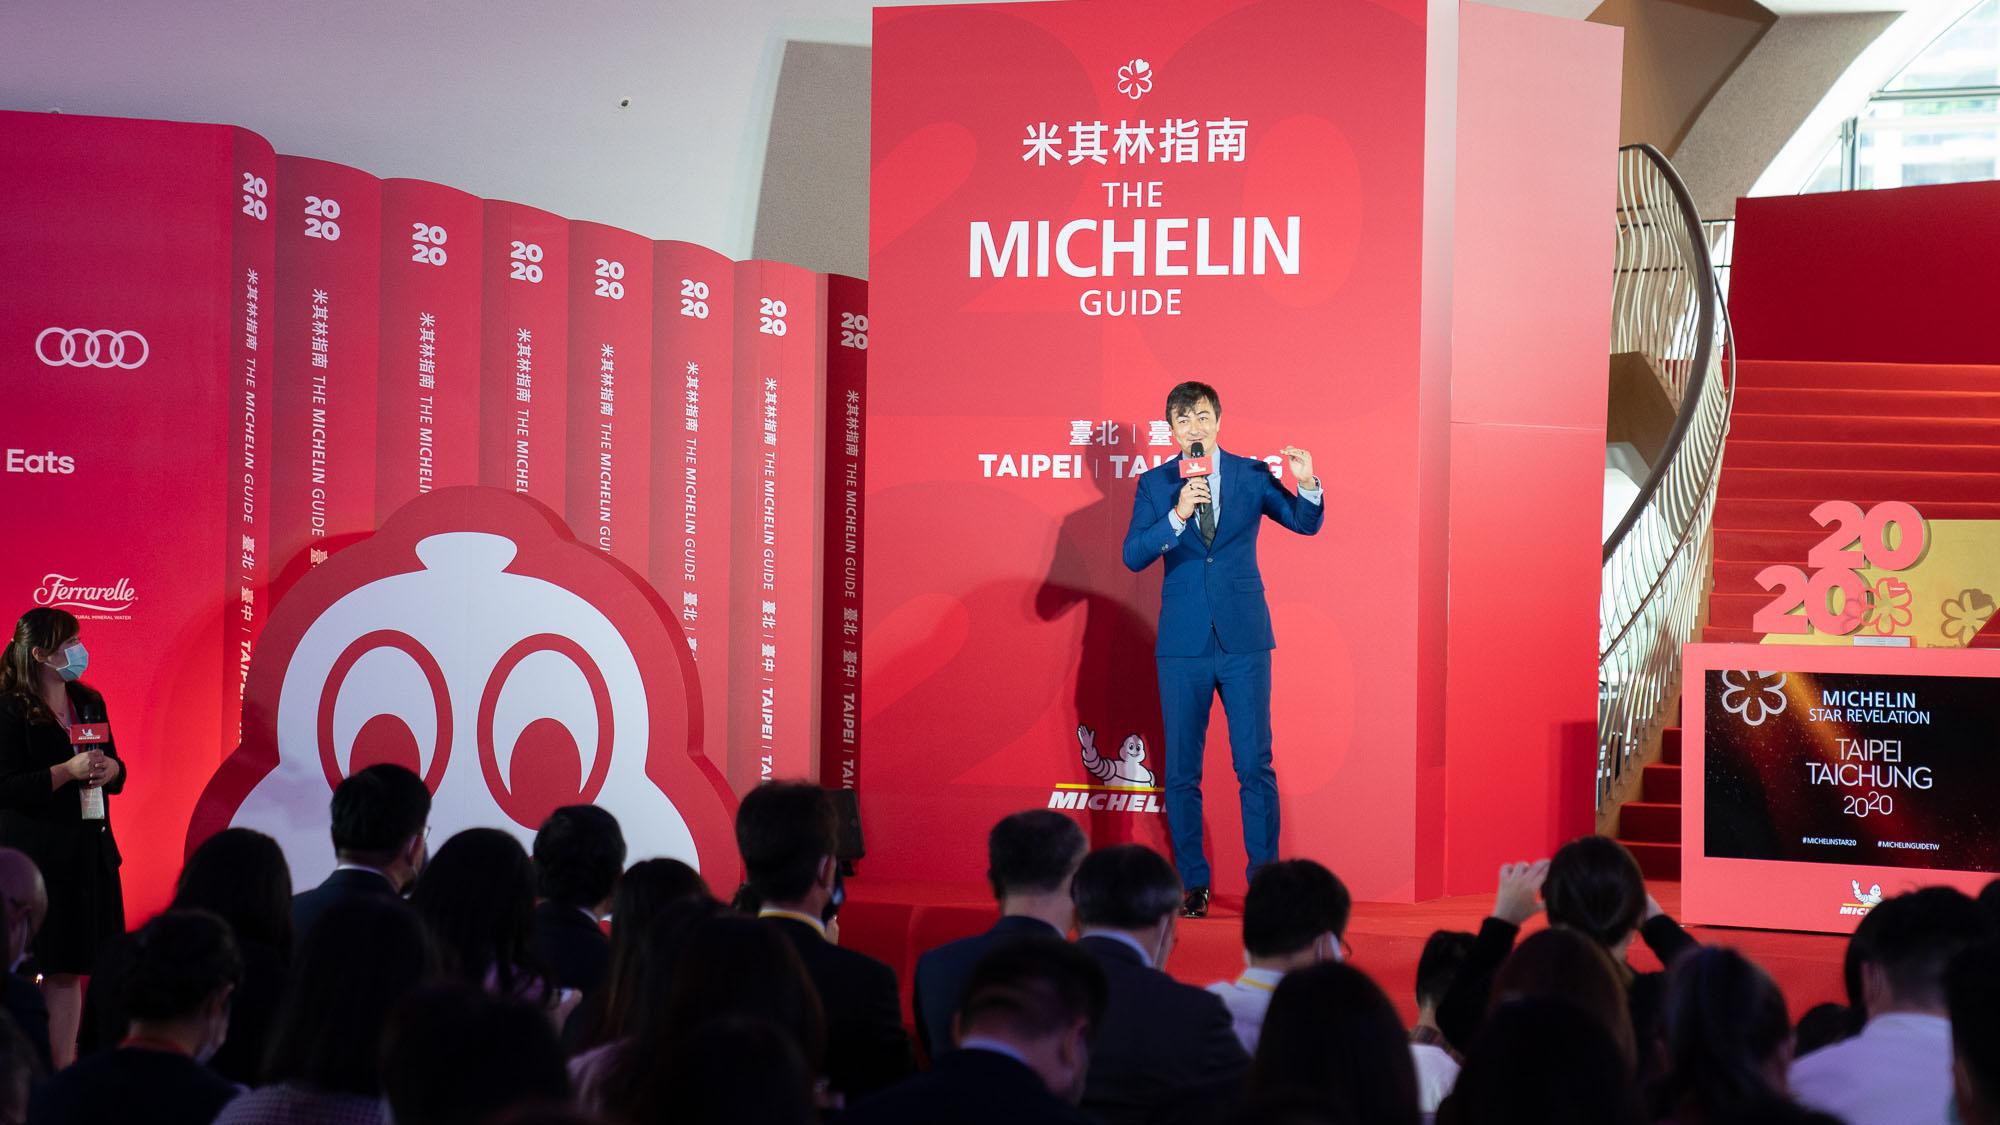 Audi Taiwan 成為《臺北臺中米其林指南2020》官方汽車合作夥伴